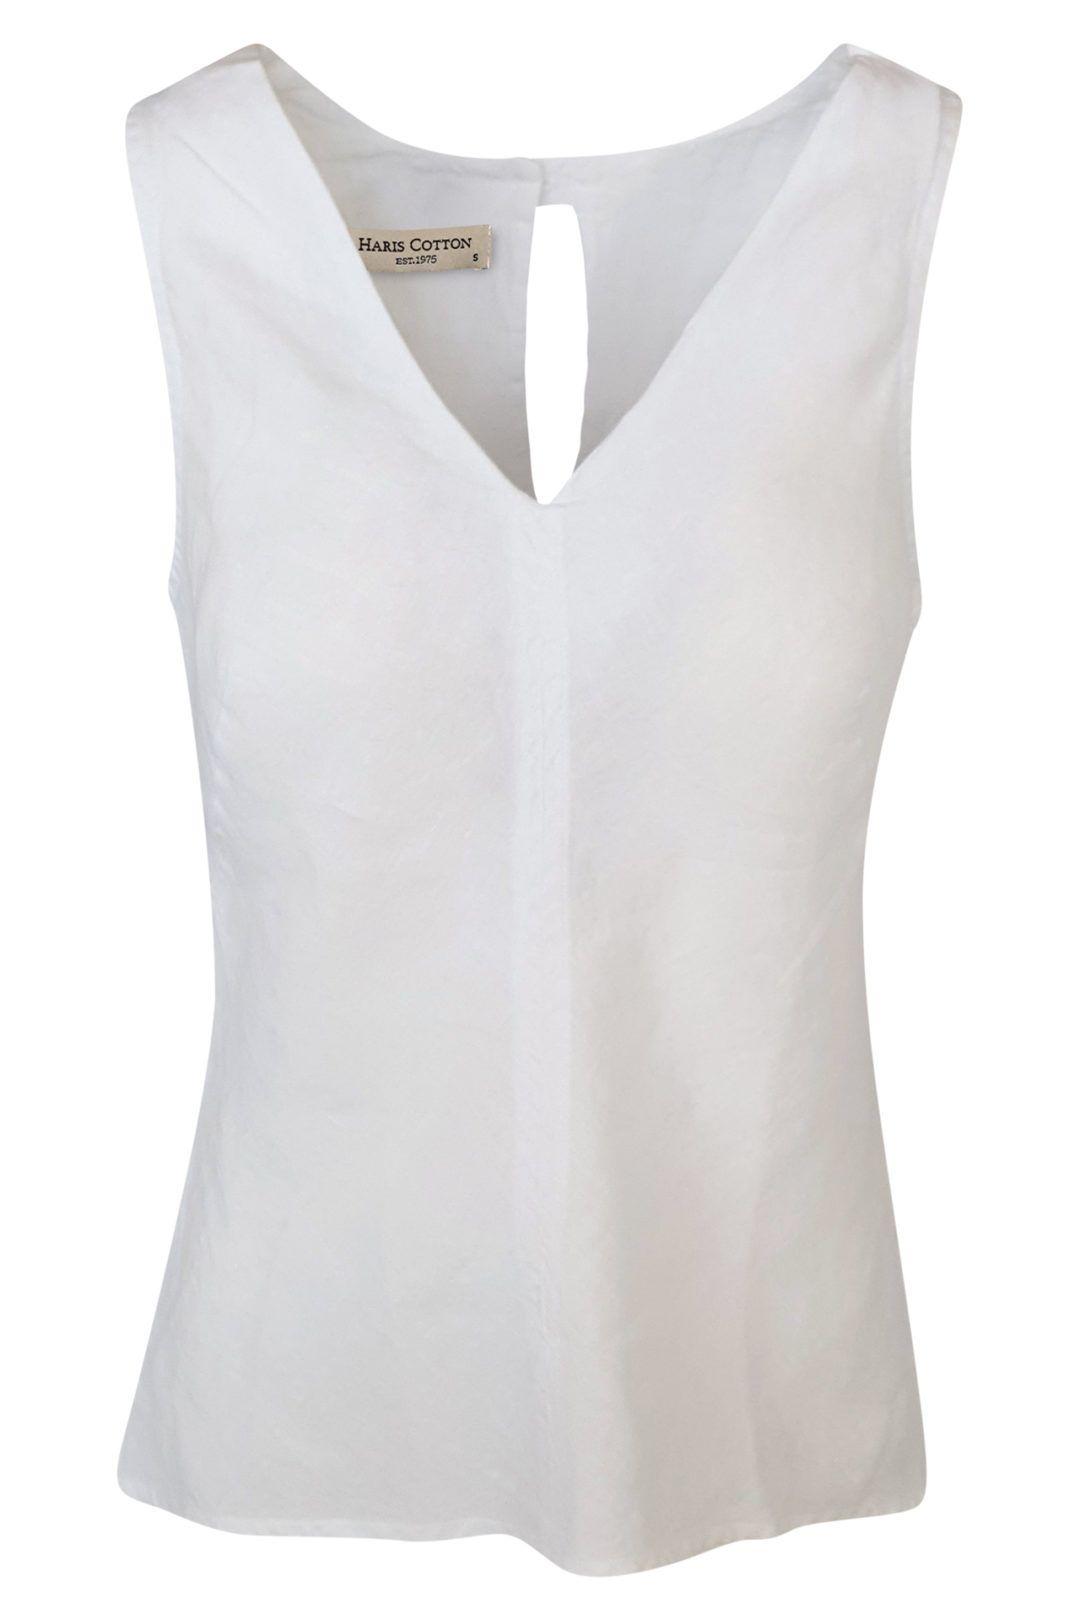 Haris Cotton V Neck Linen Top